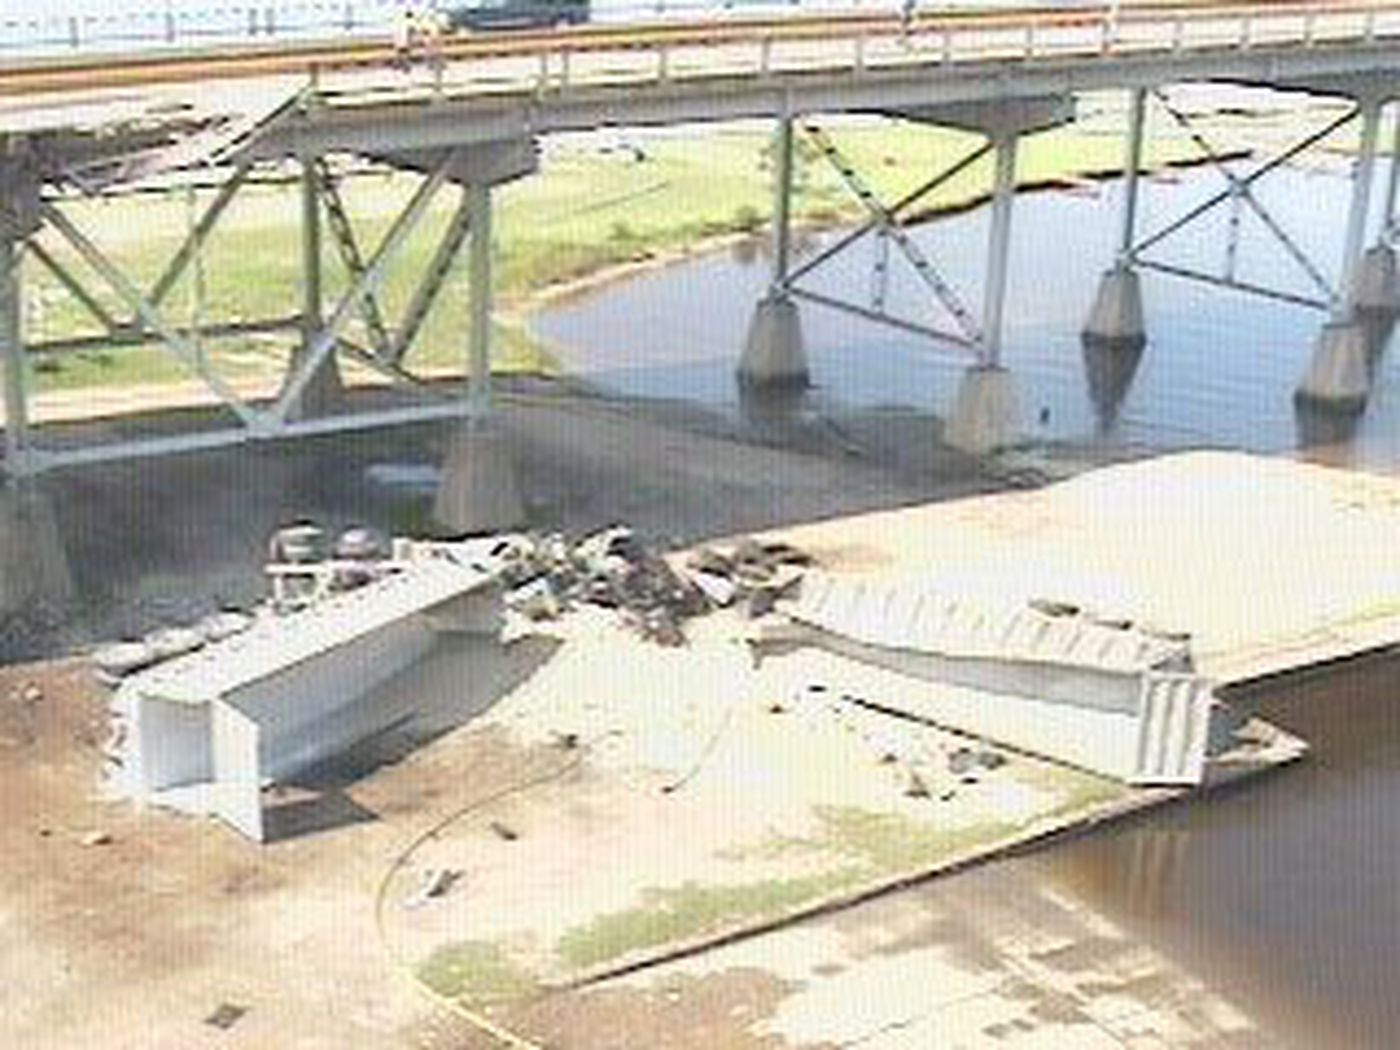 One dead in 18 wheeler accident on I-10 bridge